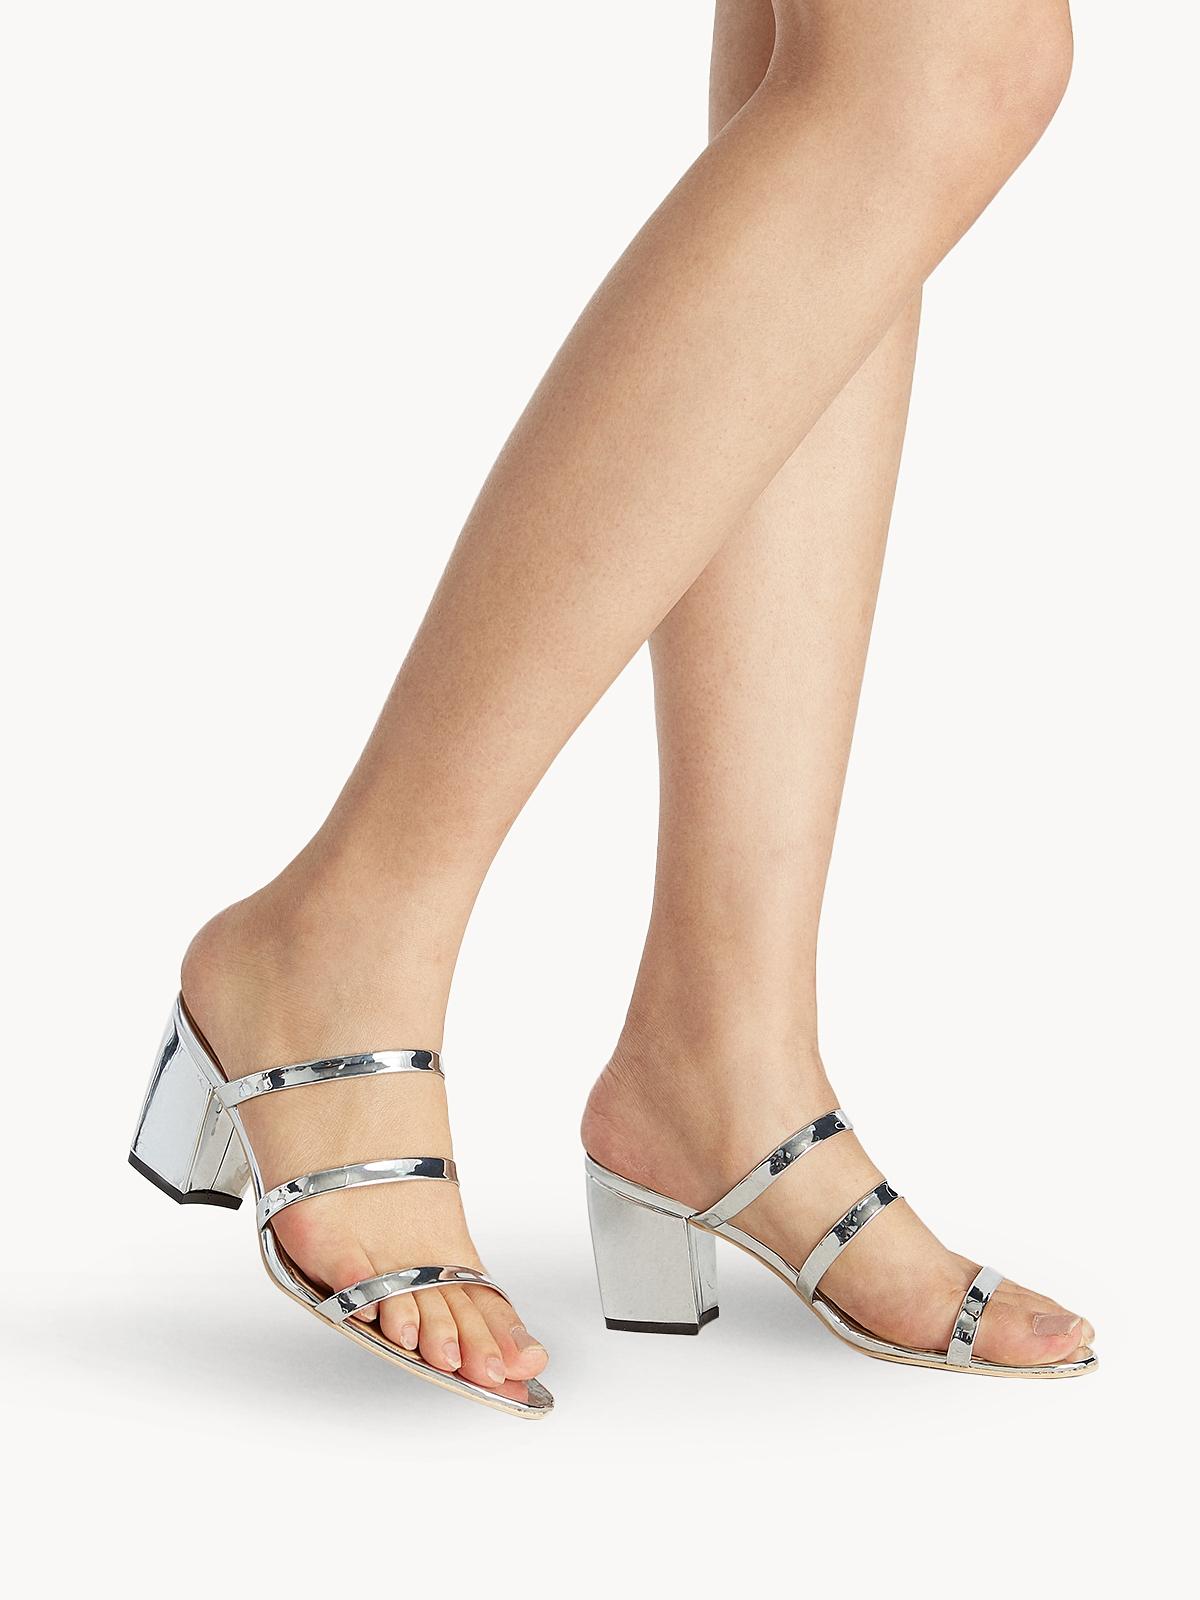 Tri Strap Mule Heels Silver